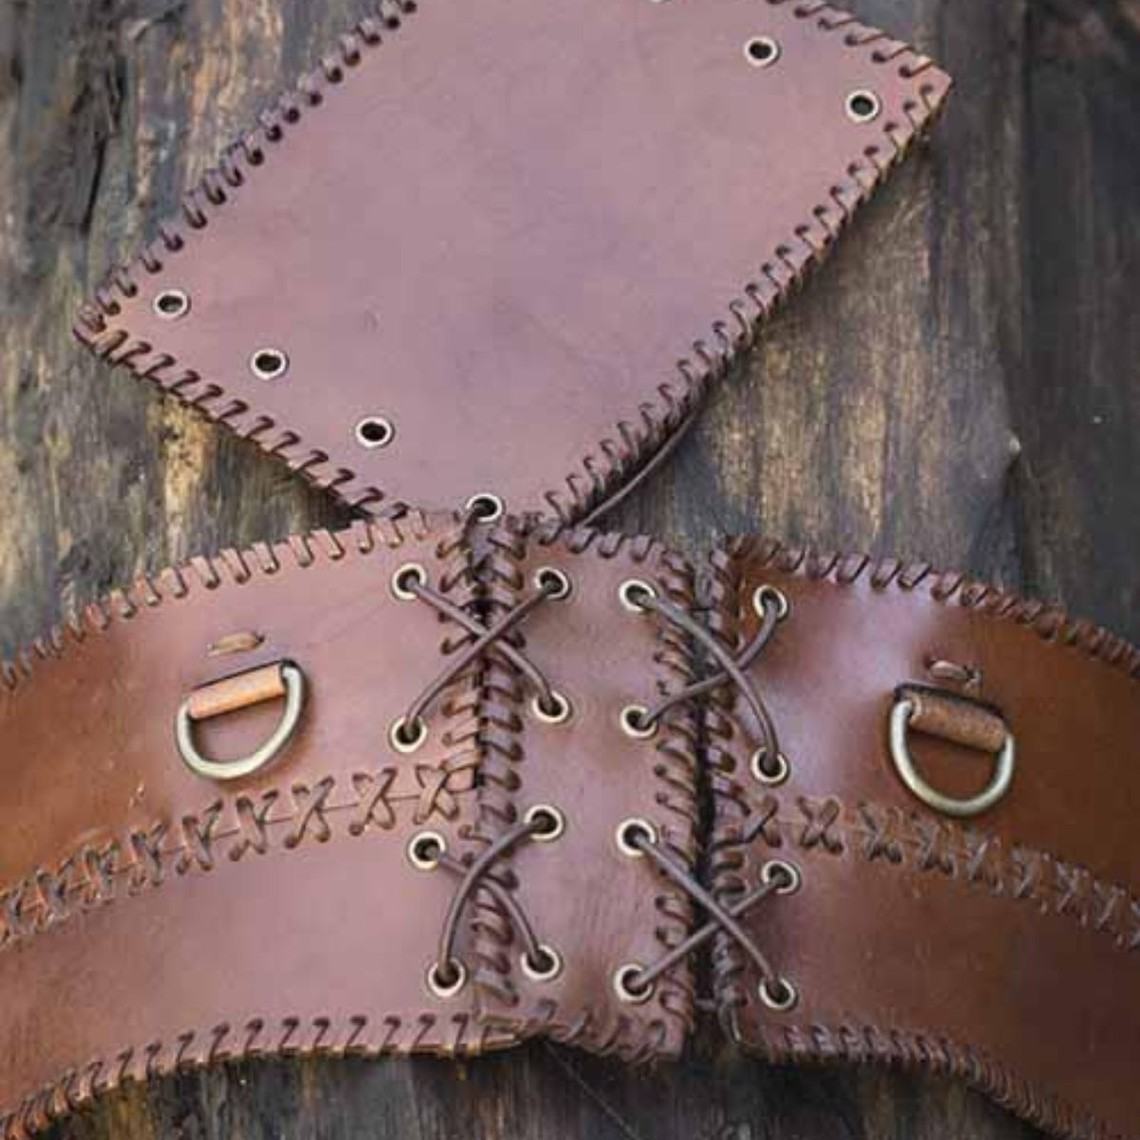 Epic Armoury Cinturón ancho, marrón